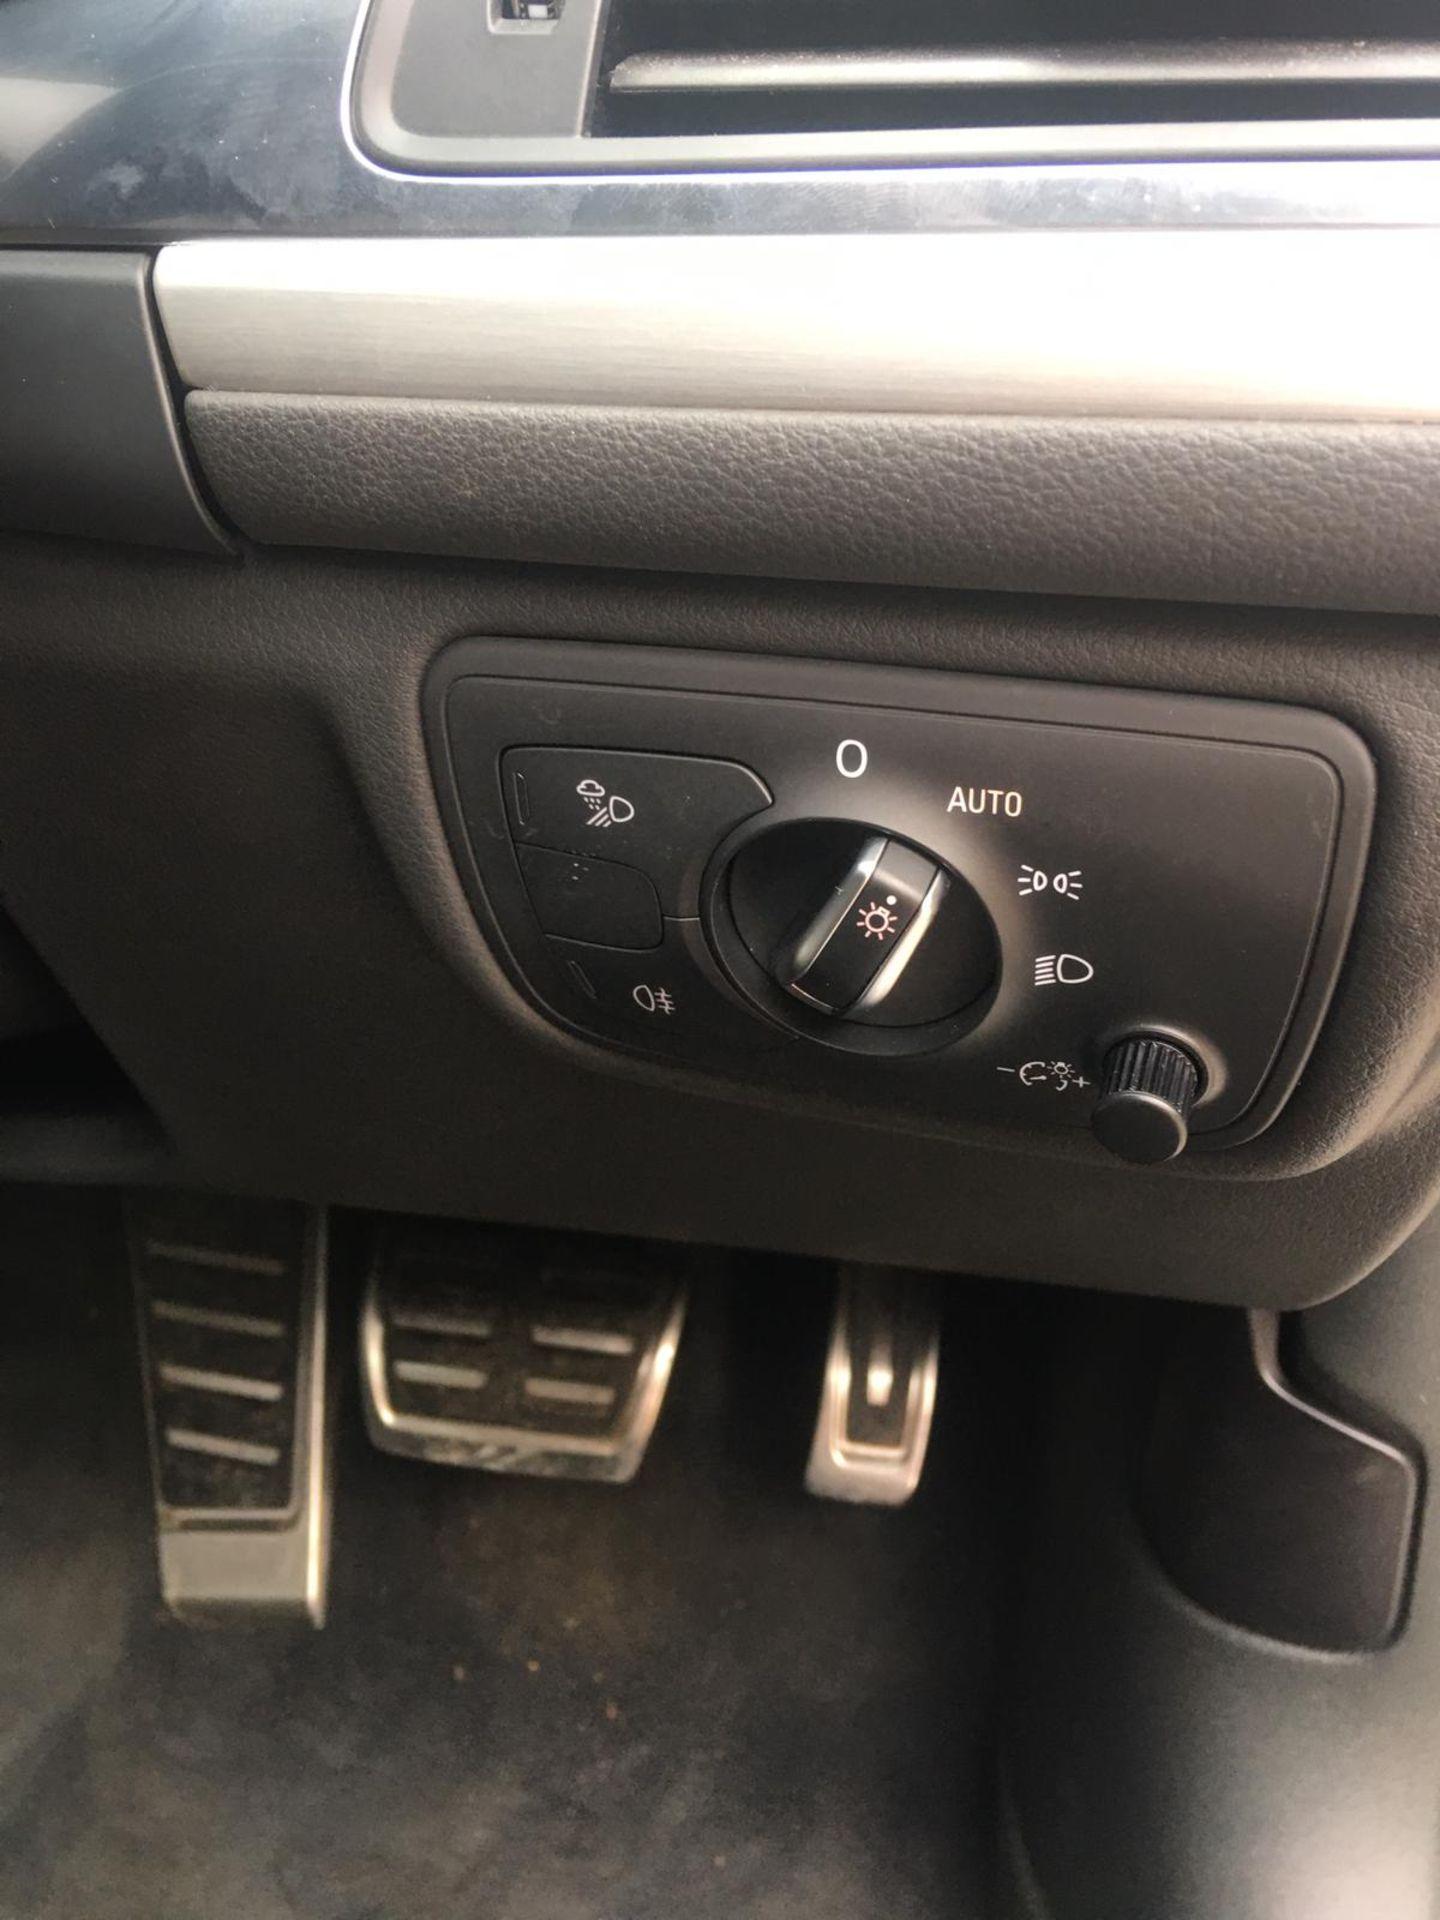 2018/18 REG AUDI A6 S LINE TDI ULTRA SEMI-AUTO 2.0 DIESEL ESTATE, SHOWING 1 FORMER KEEPER *NO VAT* - Image 13 of 33